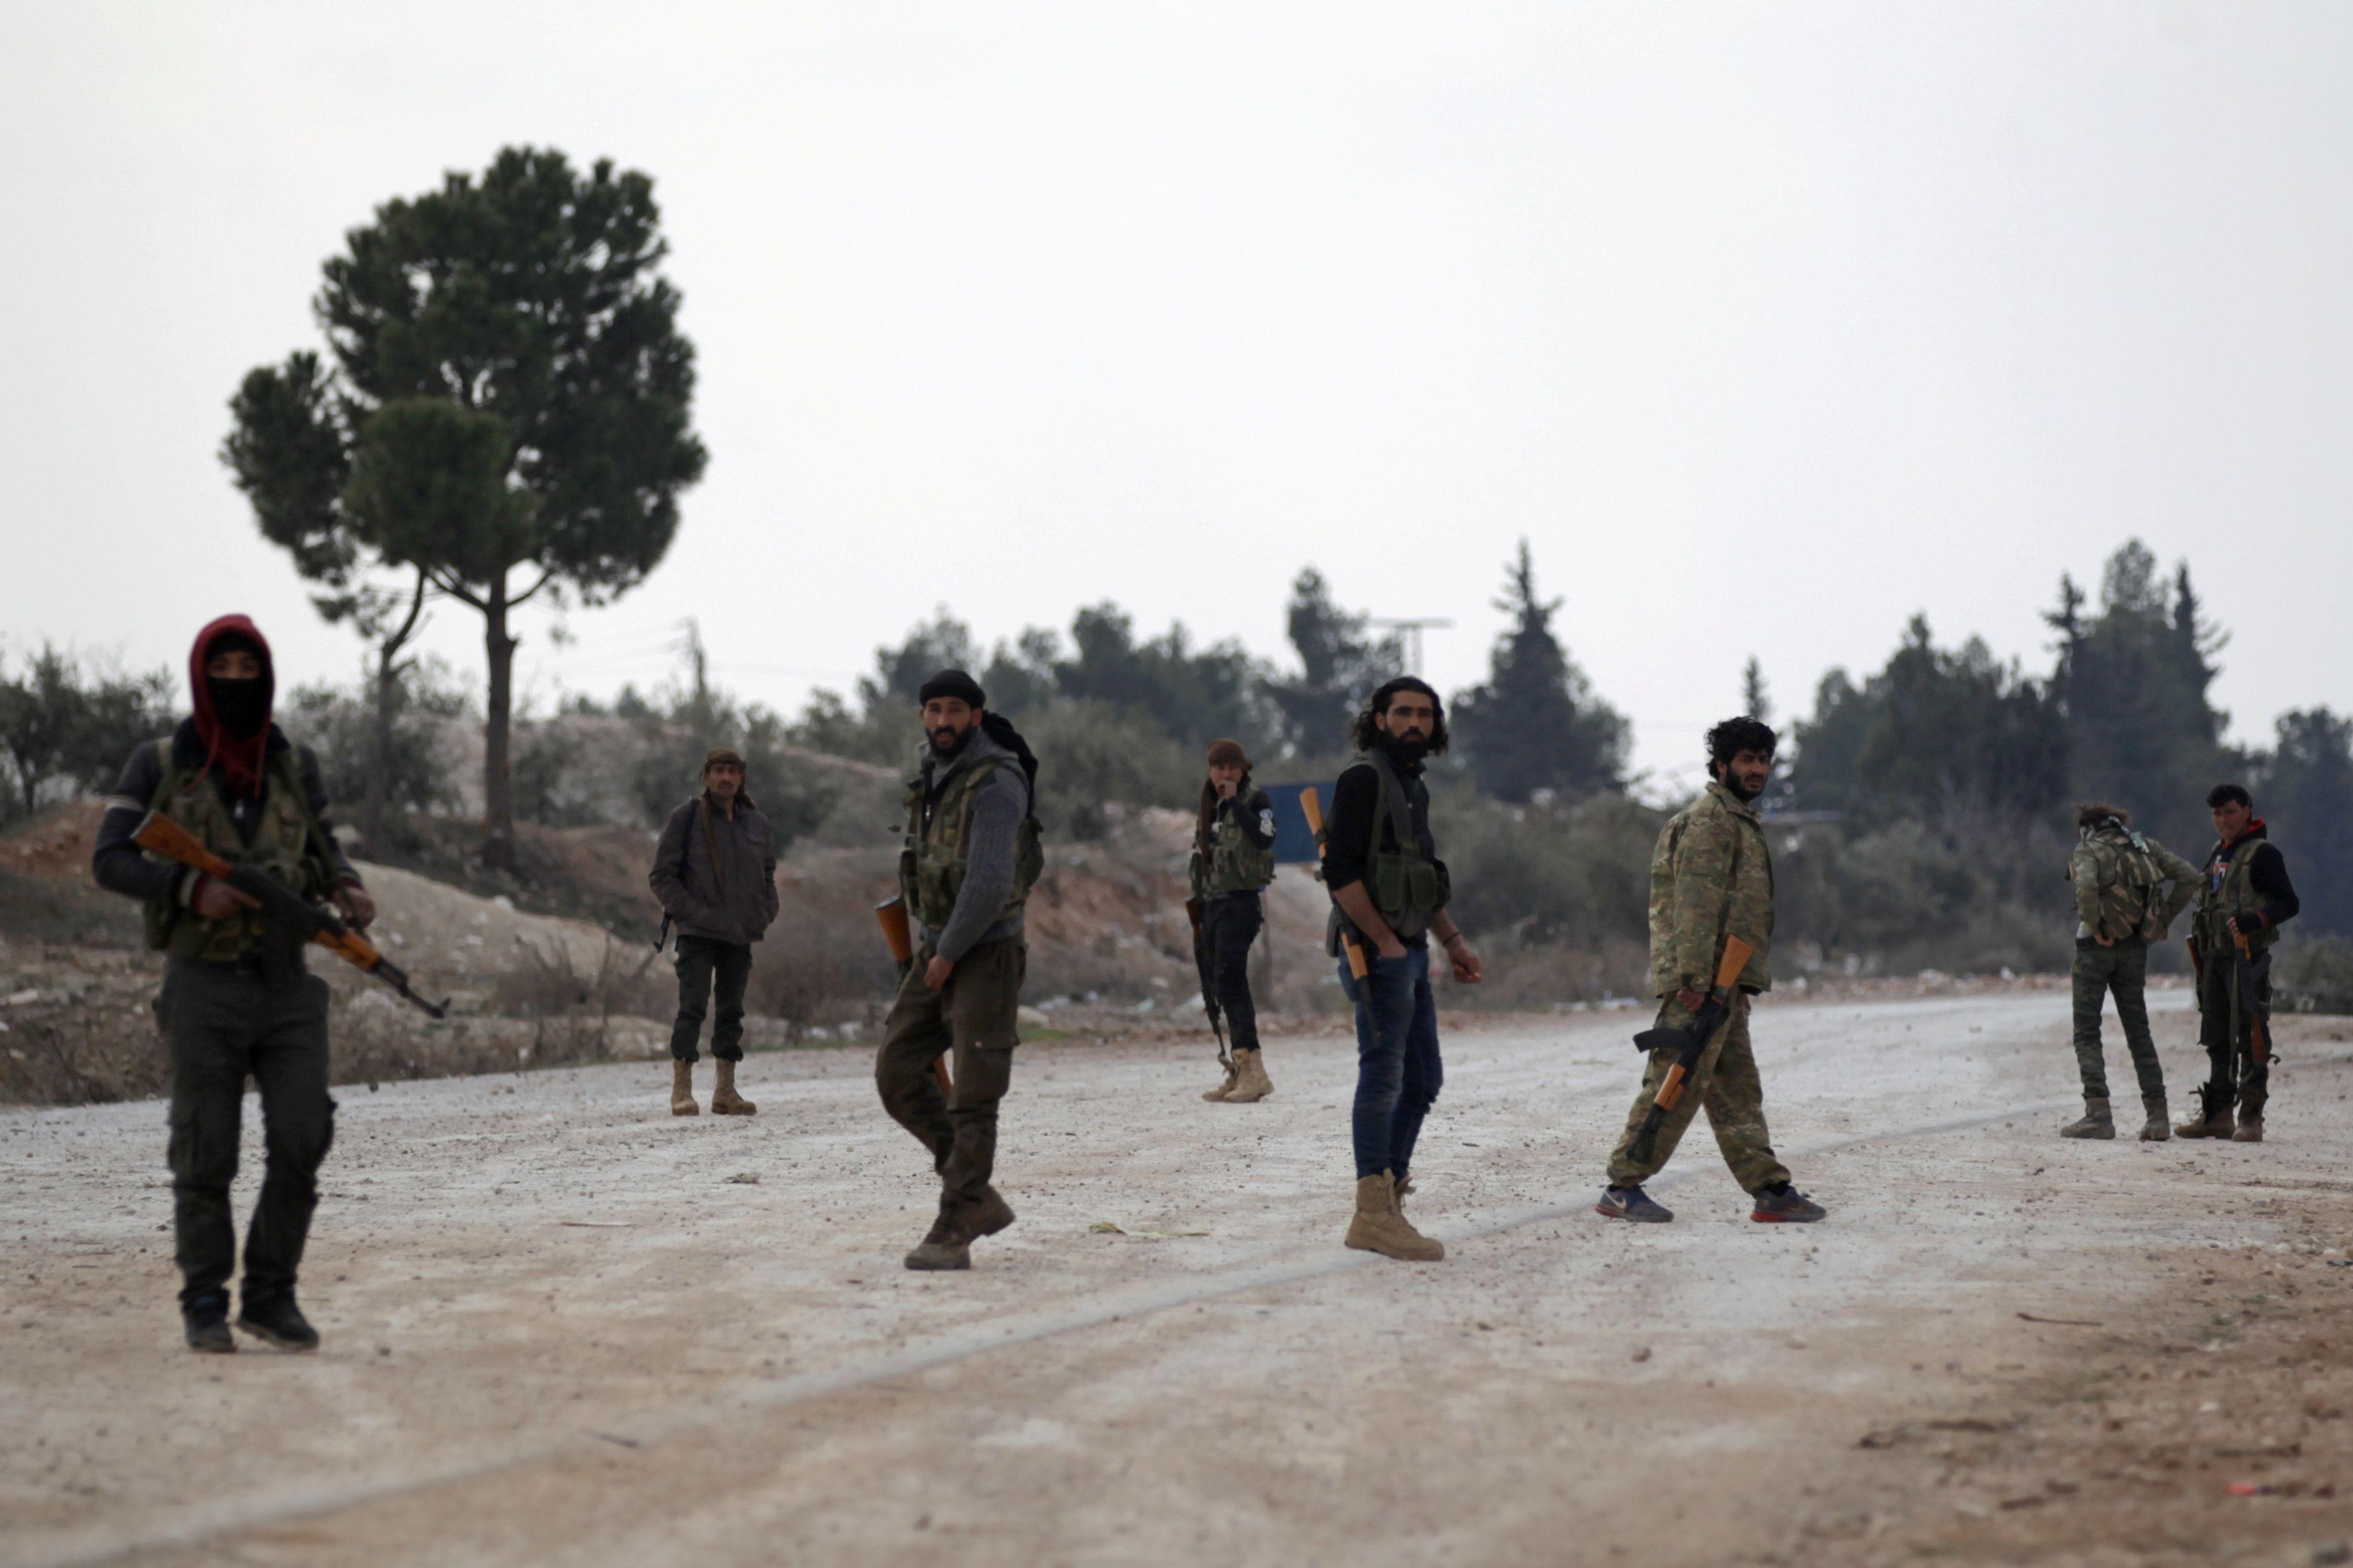 Бойцы сирийской армии, иллюстрация.